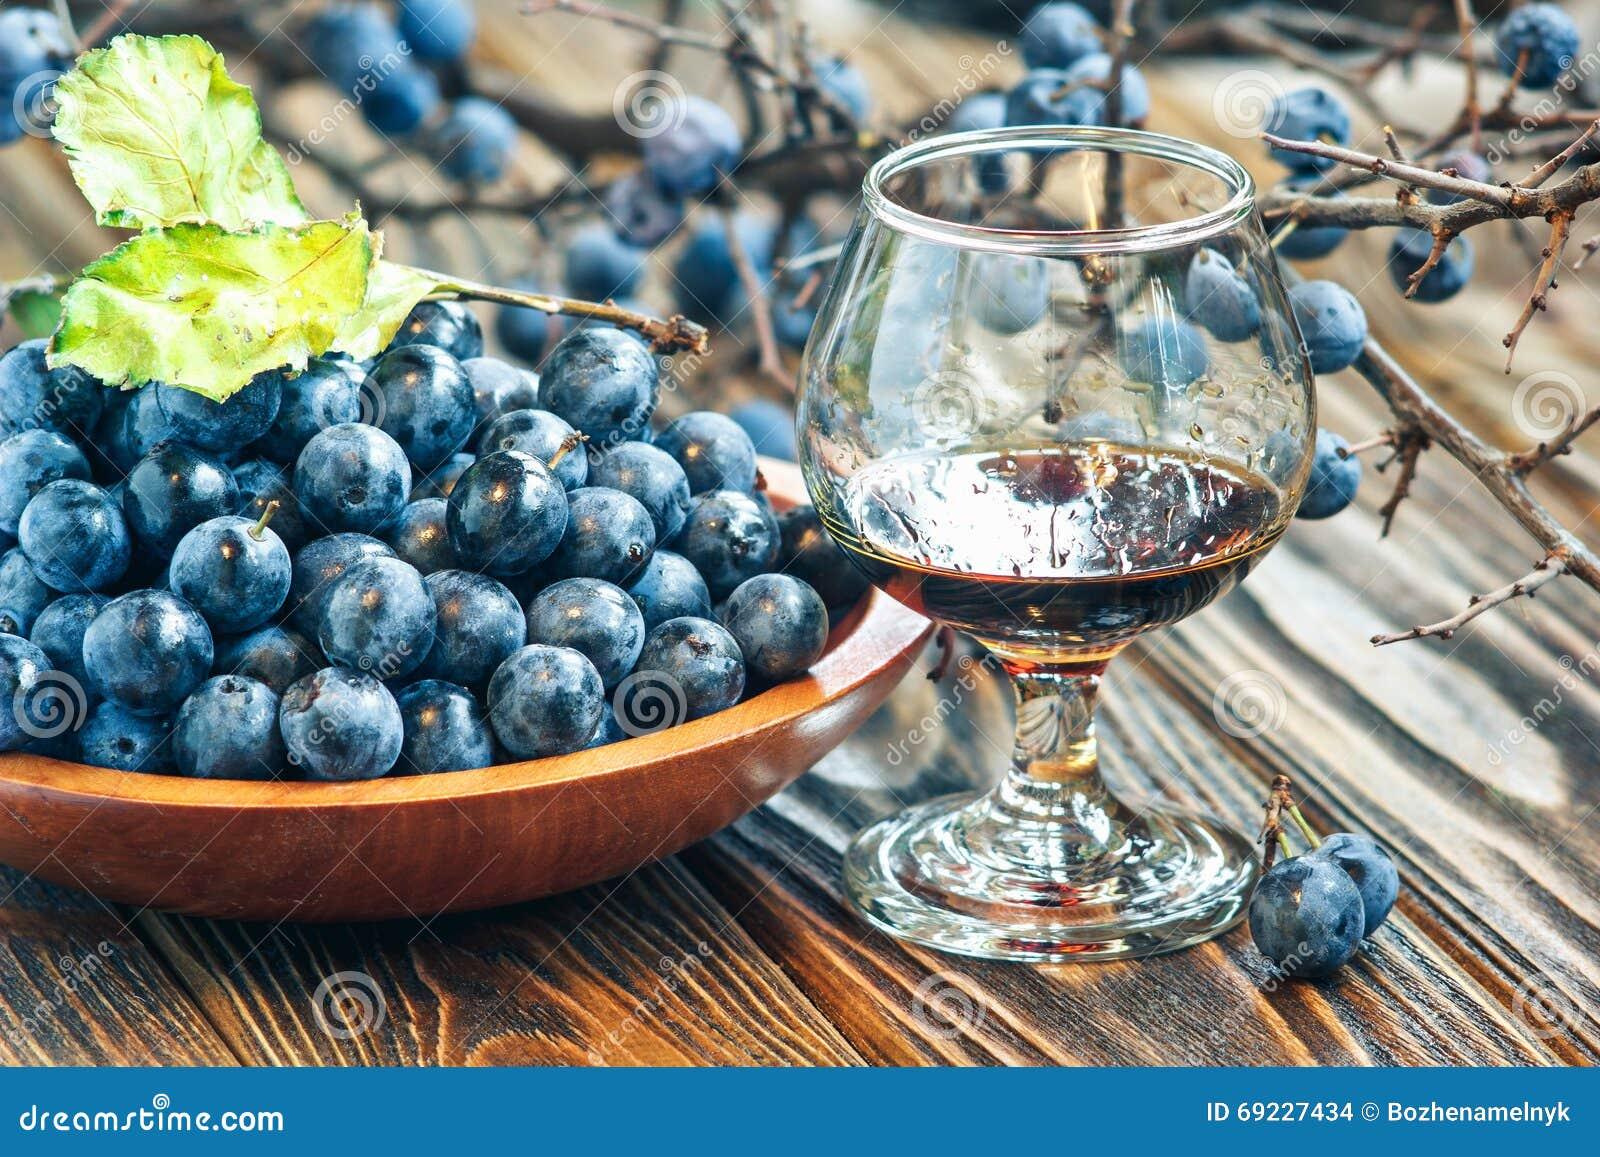 Sloe τζιν Γυαλί blackthorn του σπιτικού ελαφριού γλυκού καφεκόκκινου υγρού Sloe-αρωματικό ηδύποτο ή κρασί